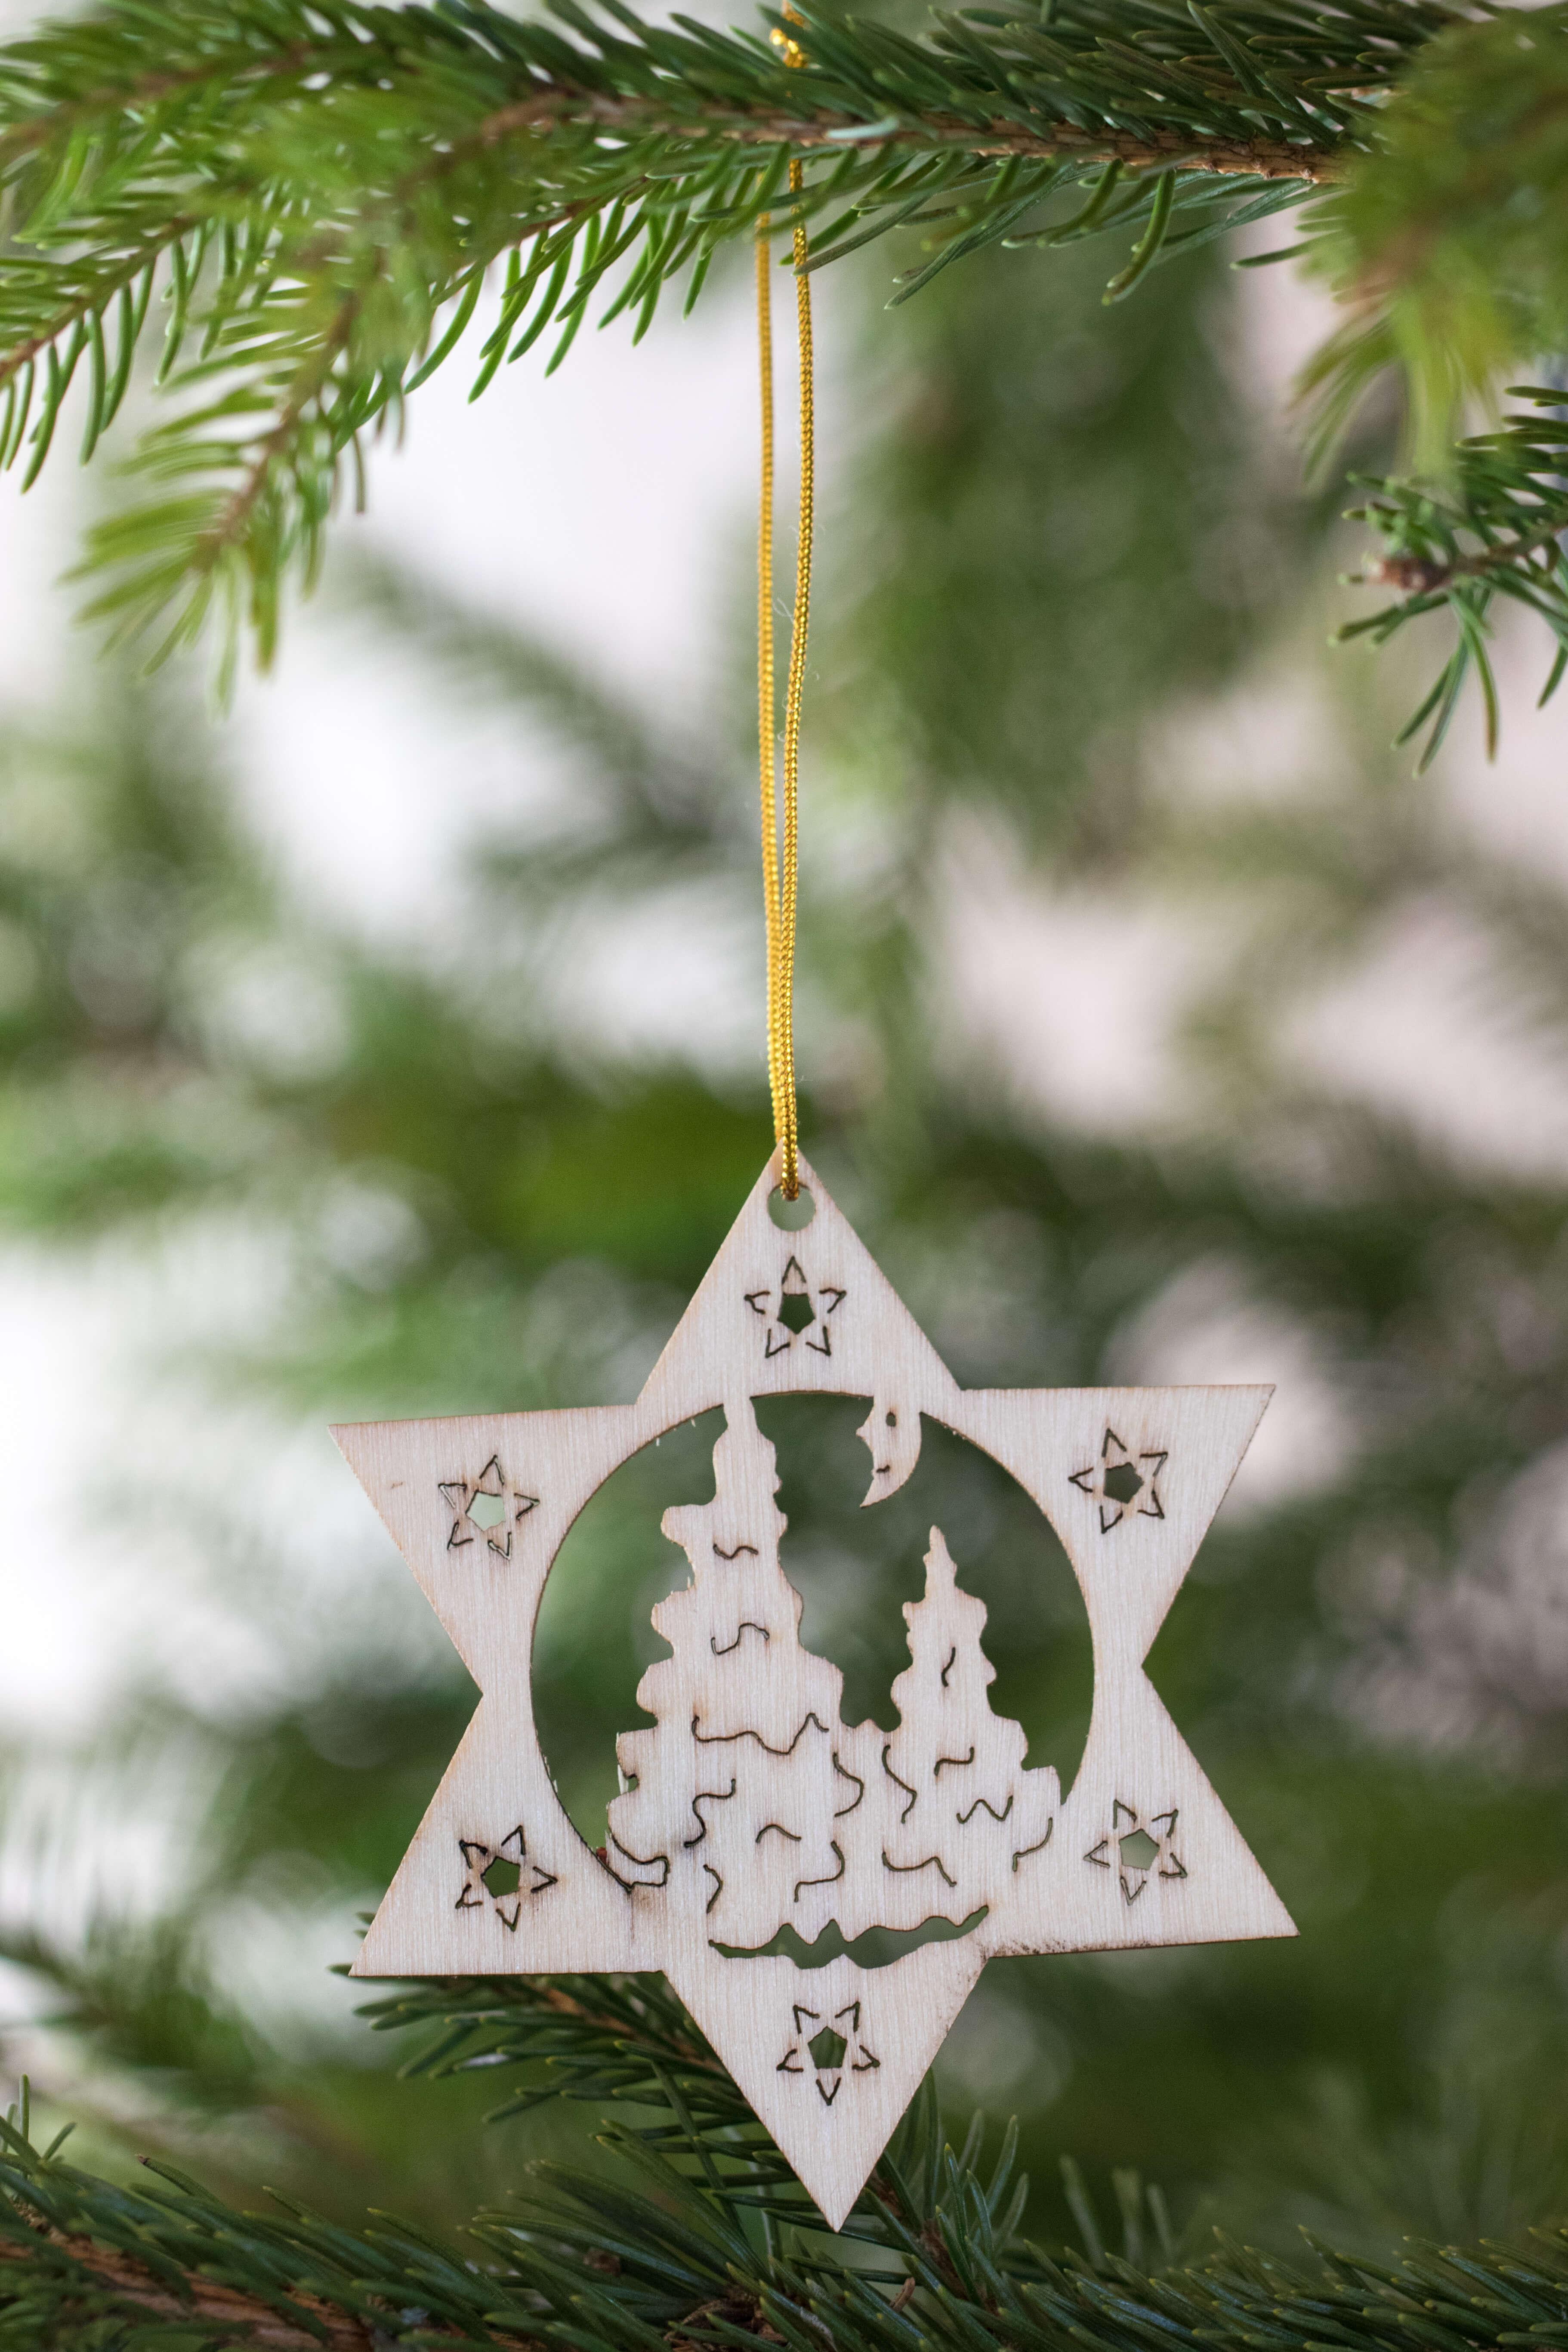 Holzanhänger Stern 8cm Motiv Weihnachtsbäume 4er Set